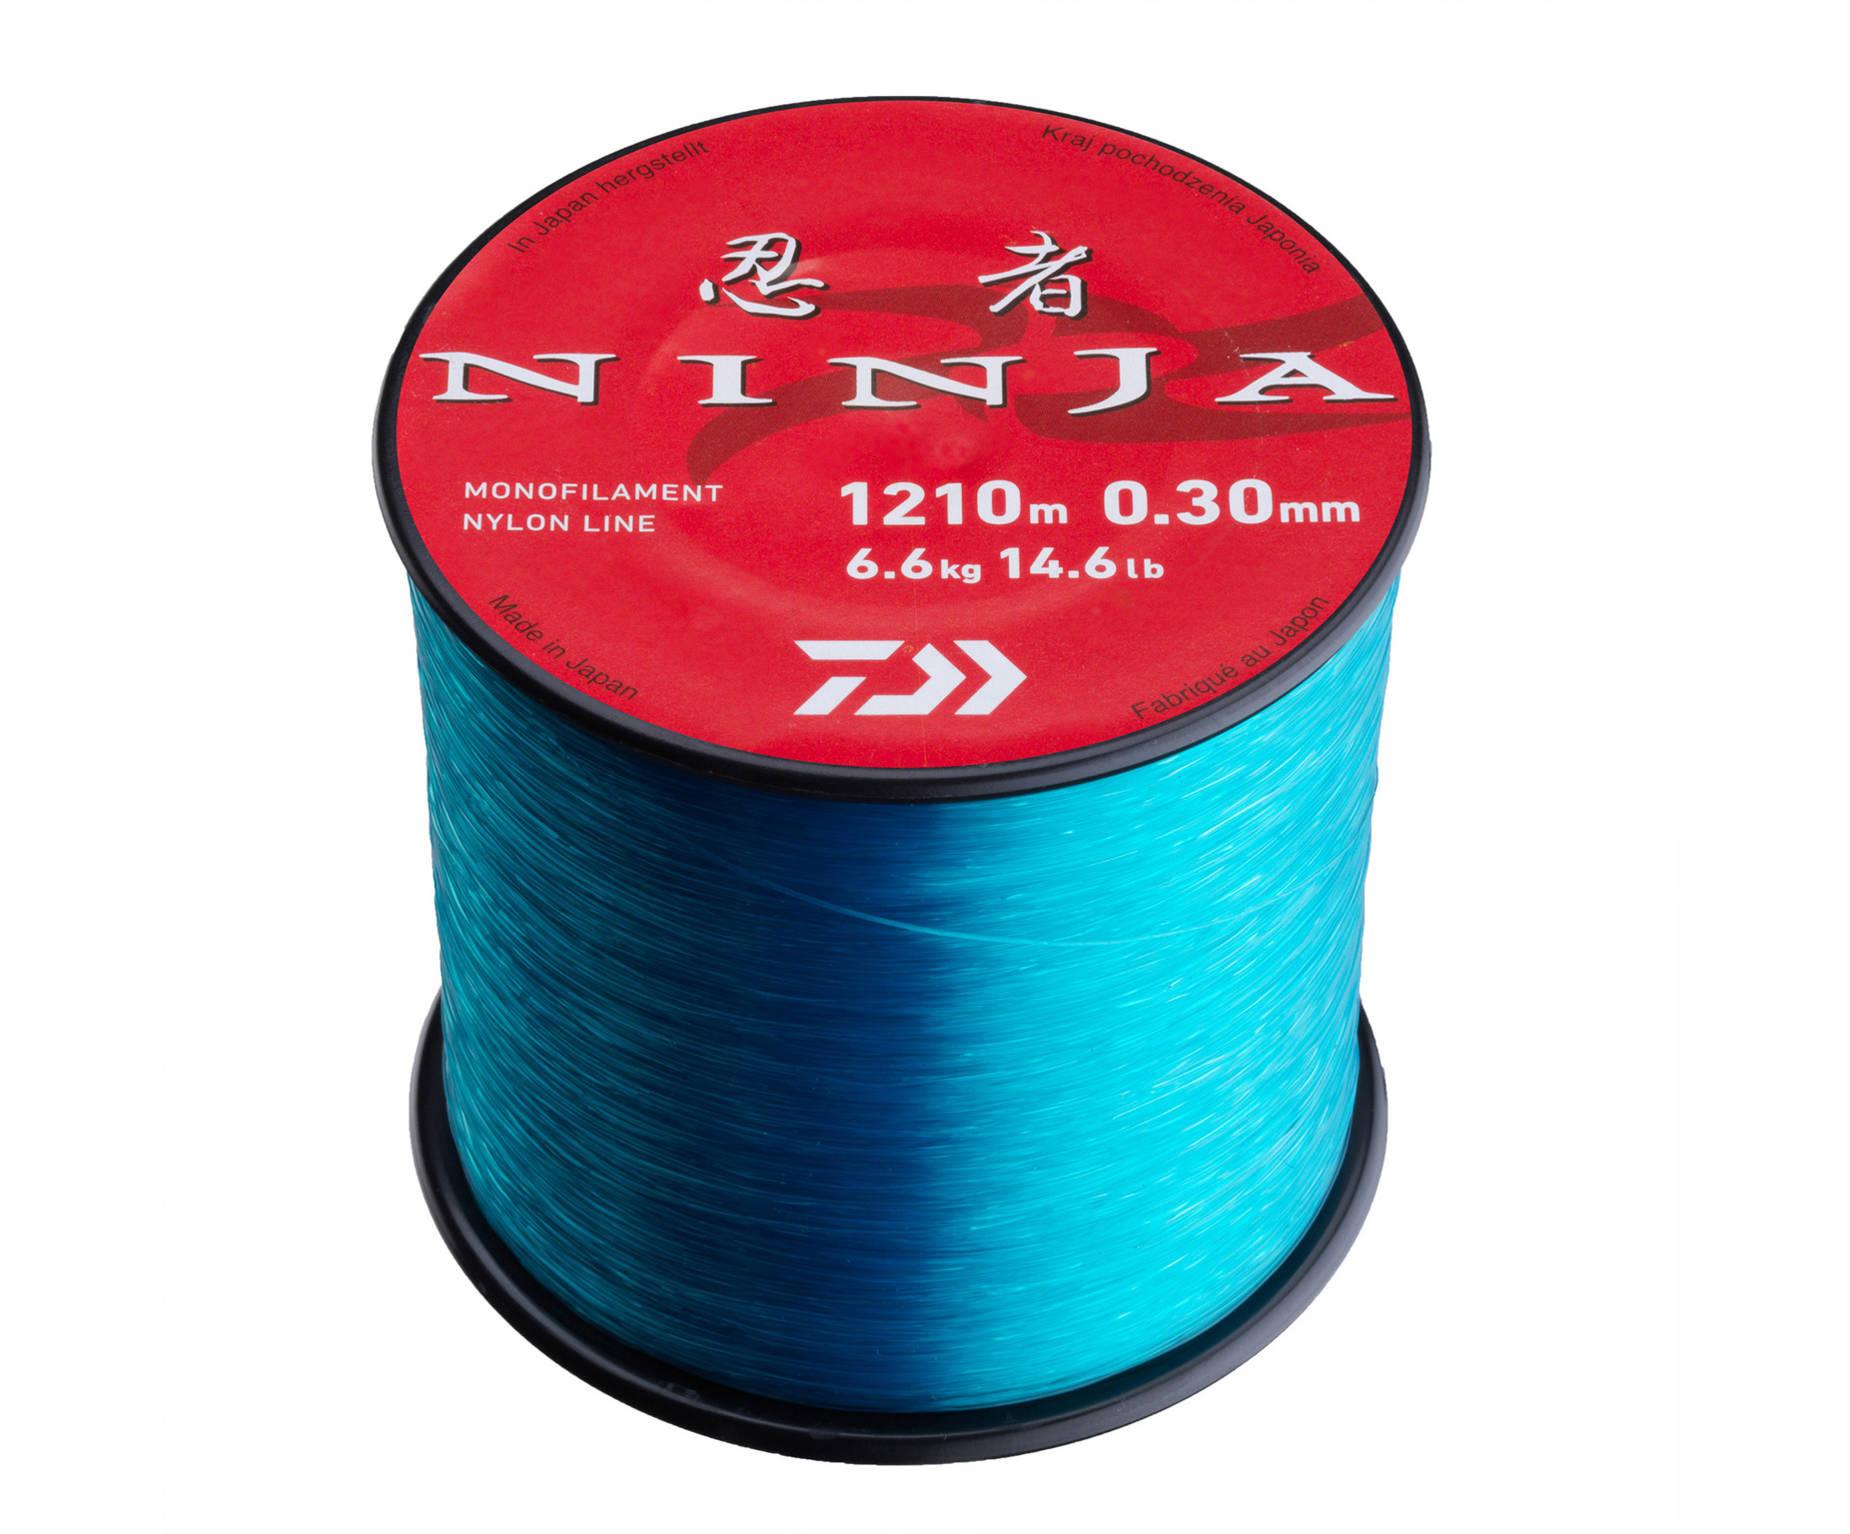 Daiwa ¯y³ka Ninja X Mono - 1060m 0.33mm 7.5kg